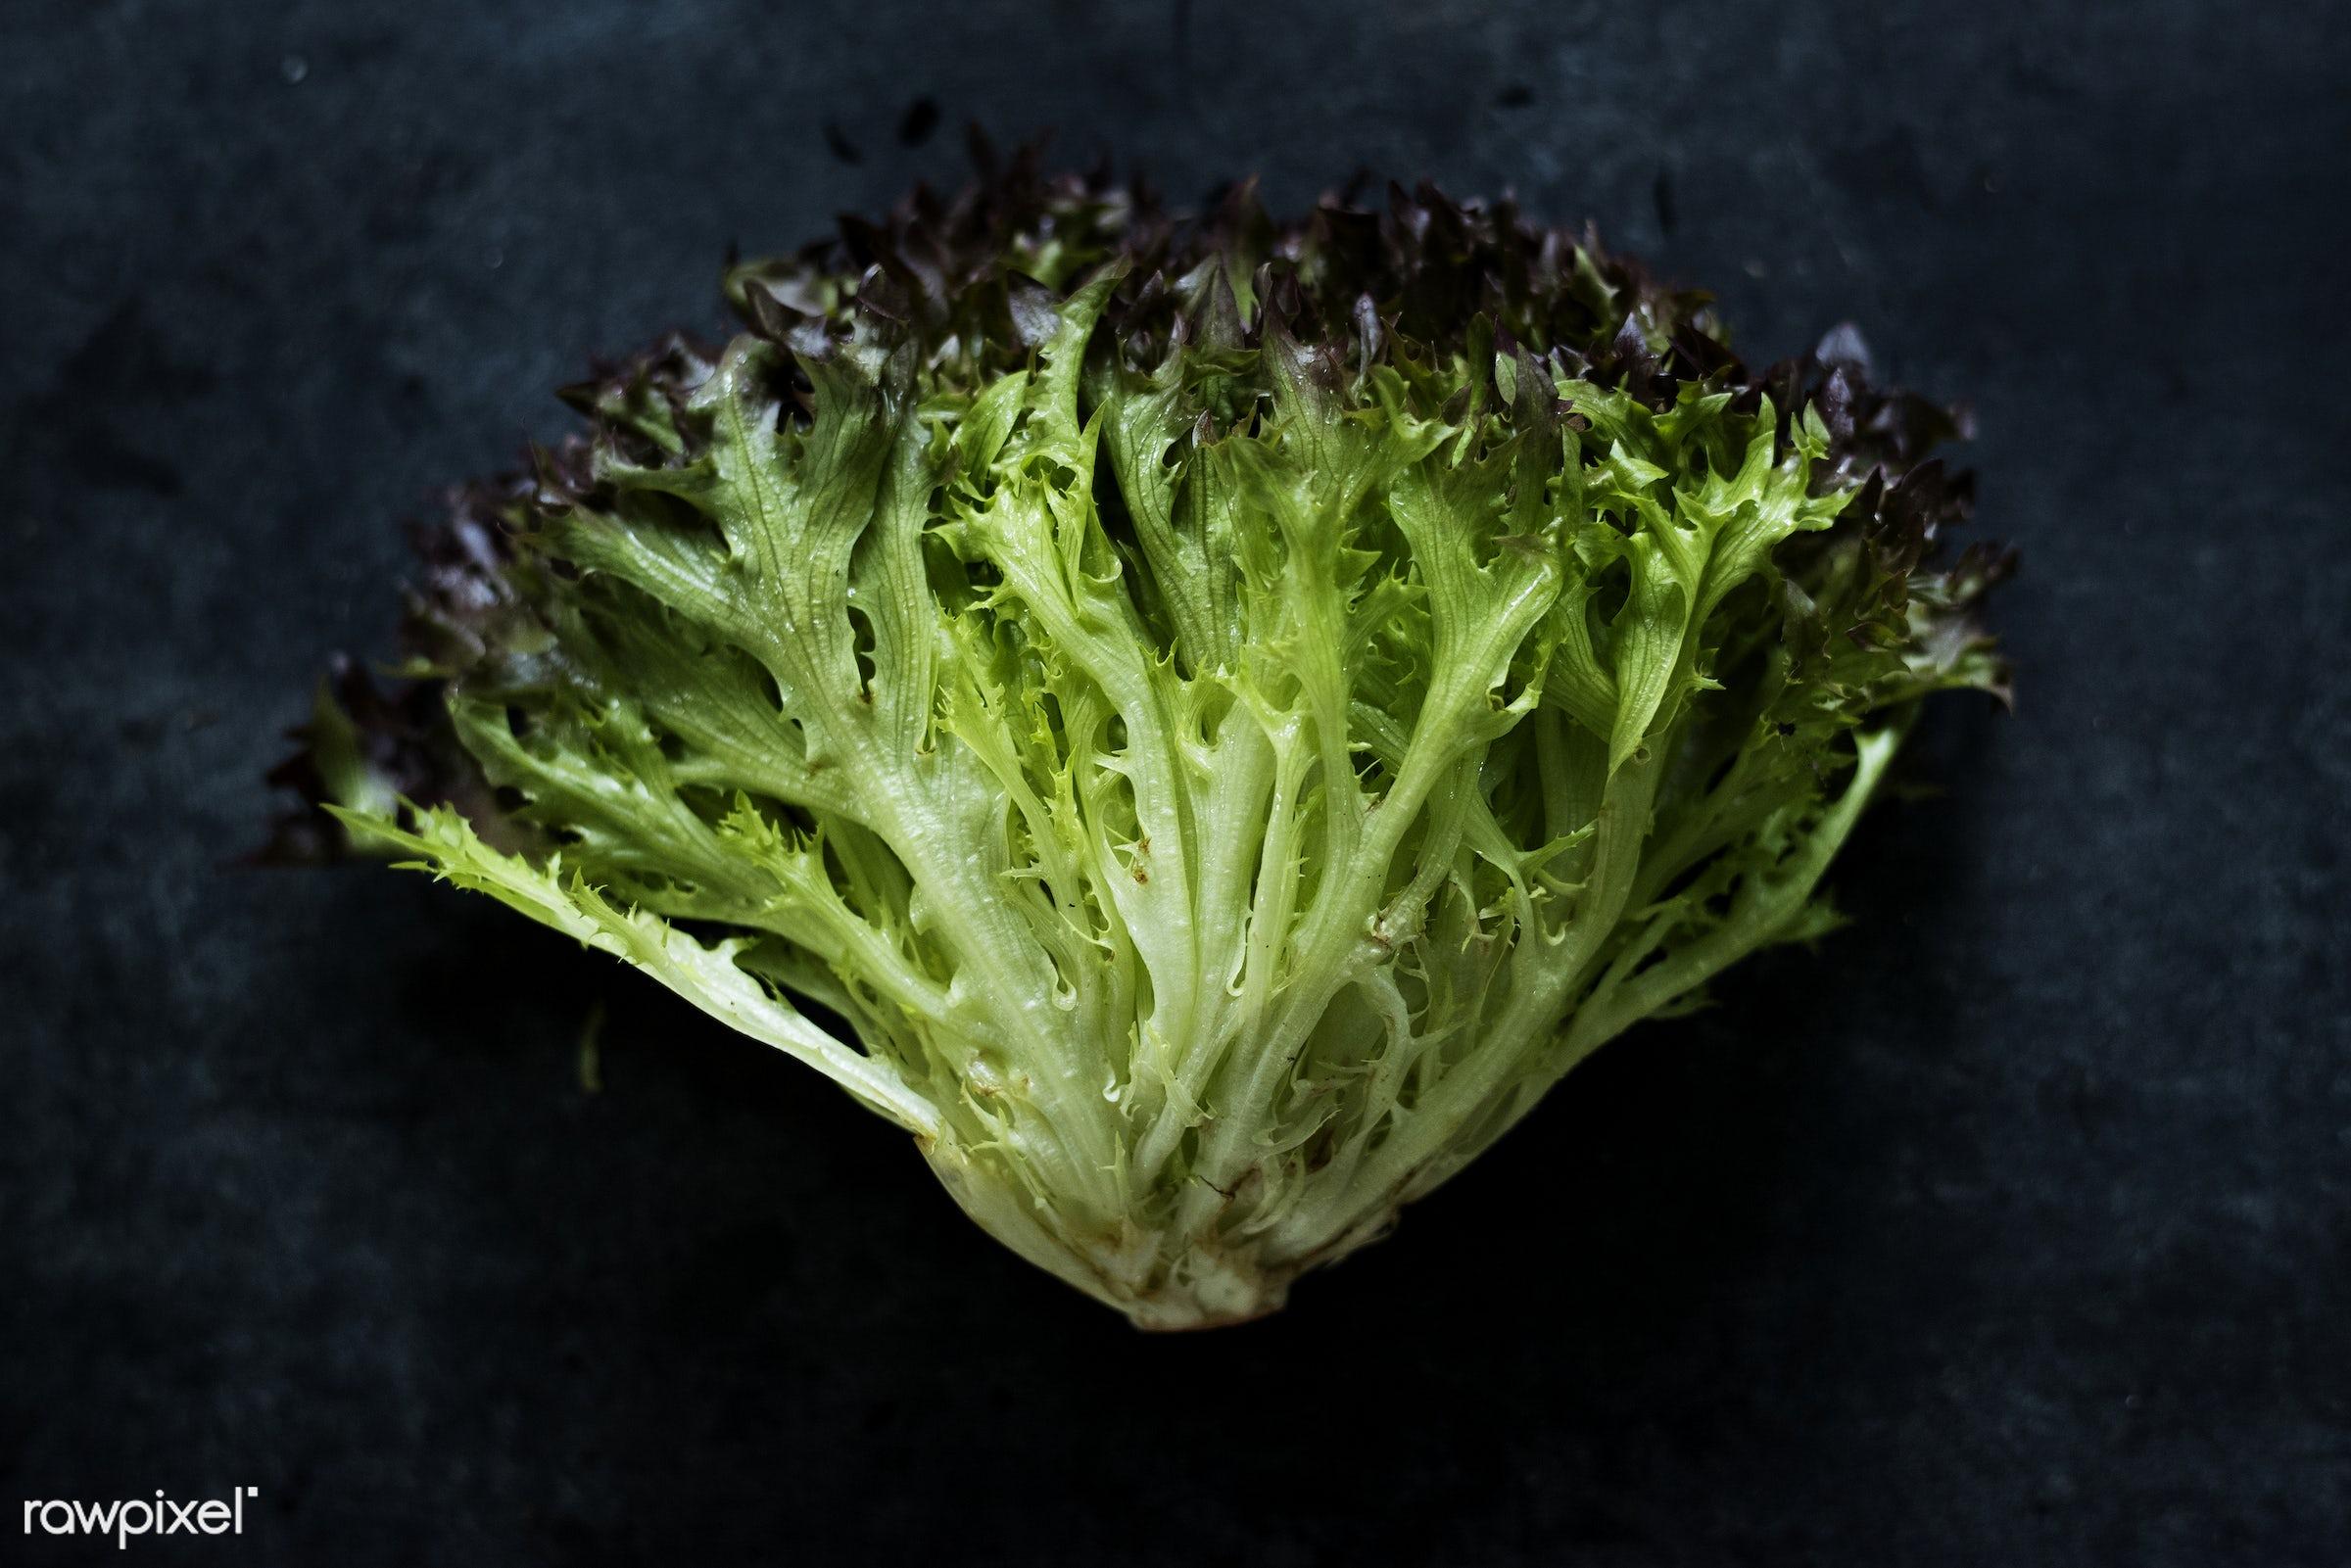 Fresh organic red leaf lettuce macro shot - salad, raw, nobody, leaves, black background, real, red leaf, organic, nature,...